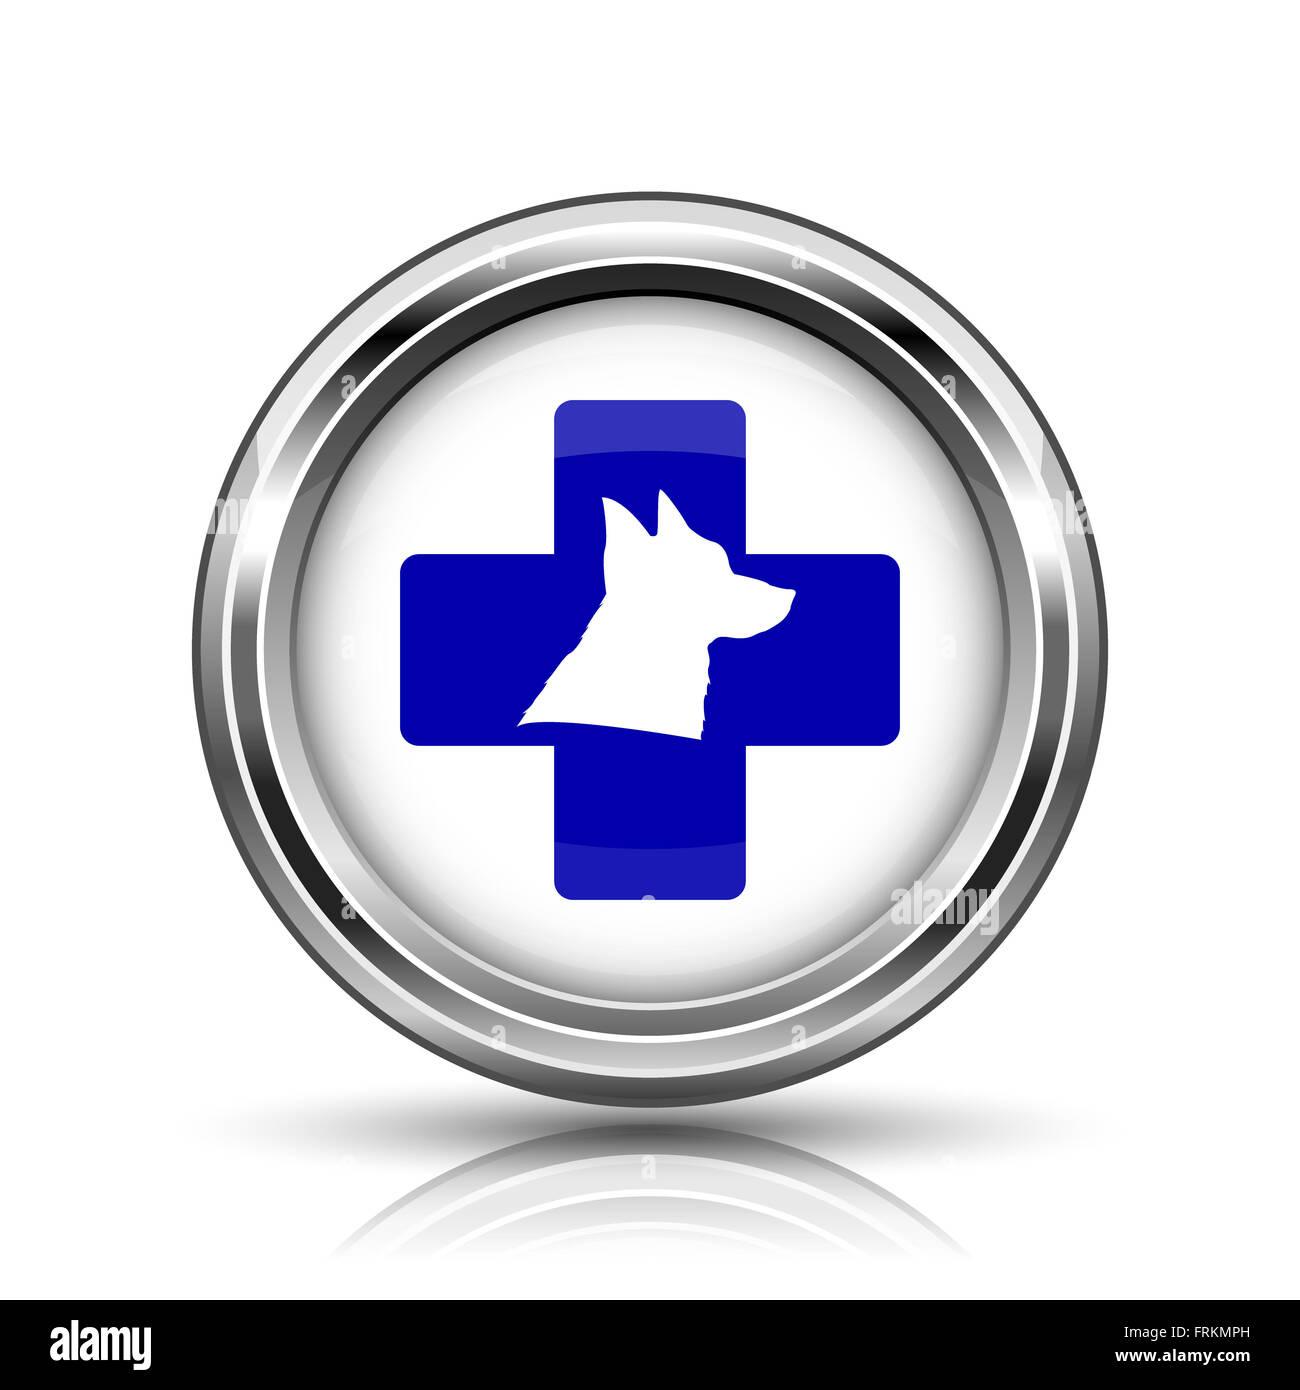 Shiny glossy icon - internet metallic button - Stock Image